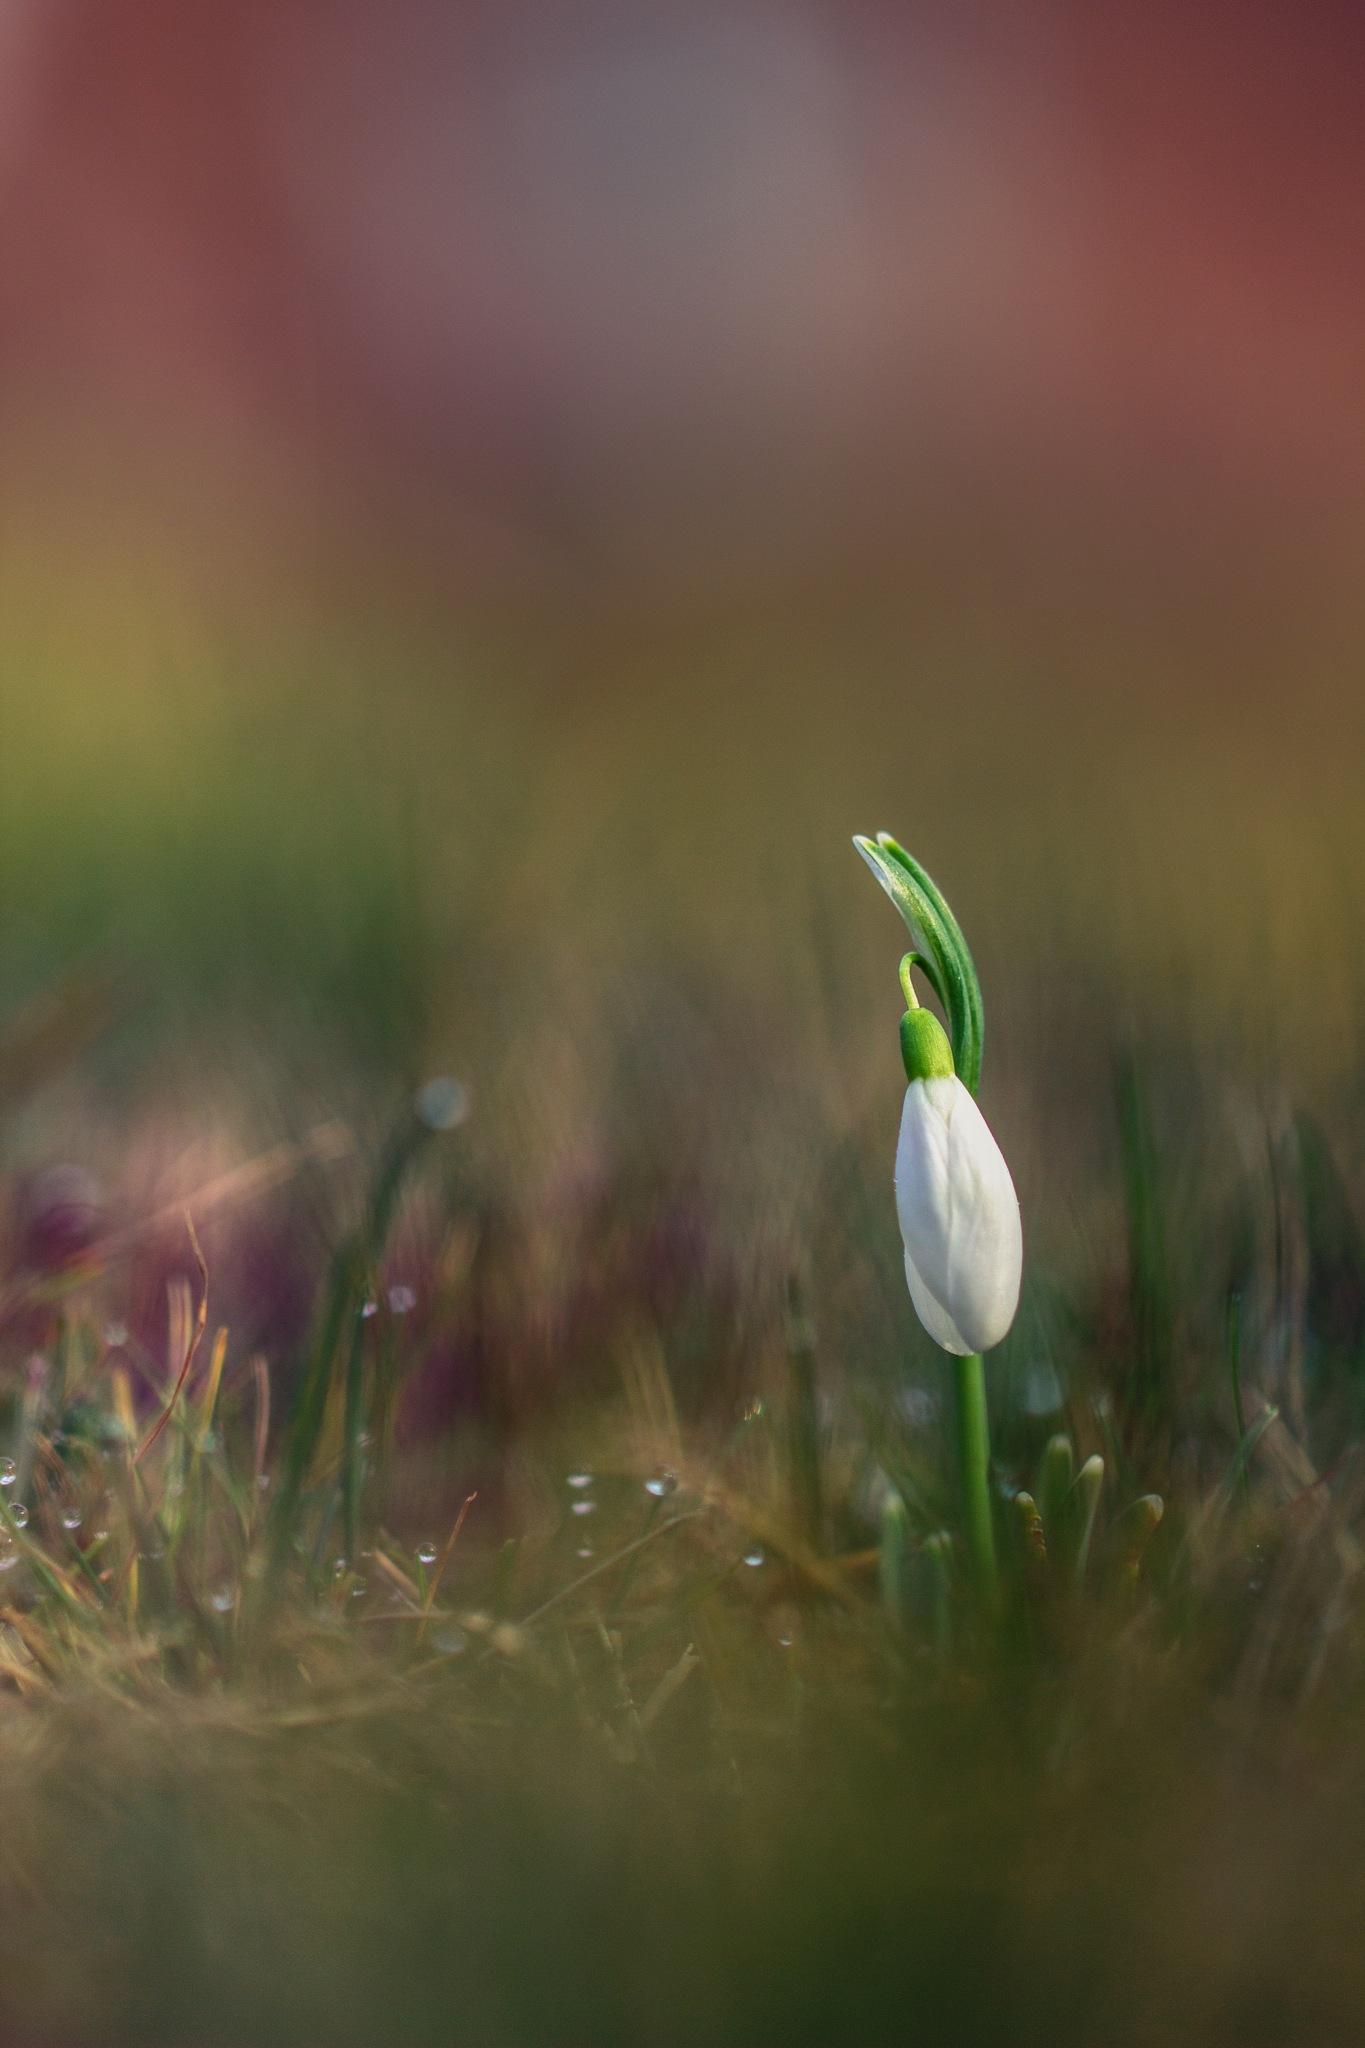 Fin de l'hiver by Yves Droeven